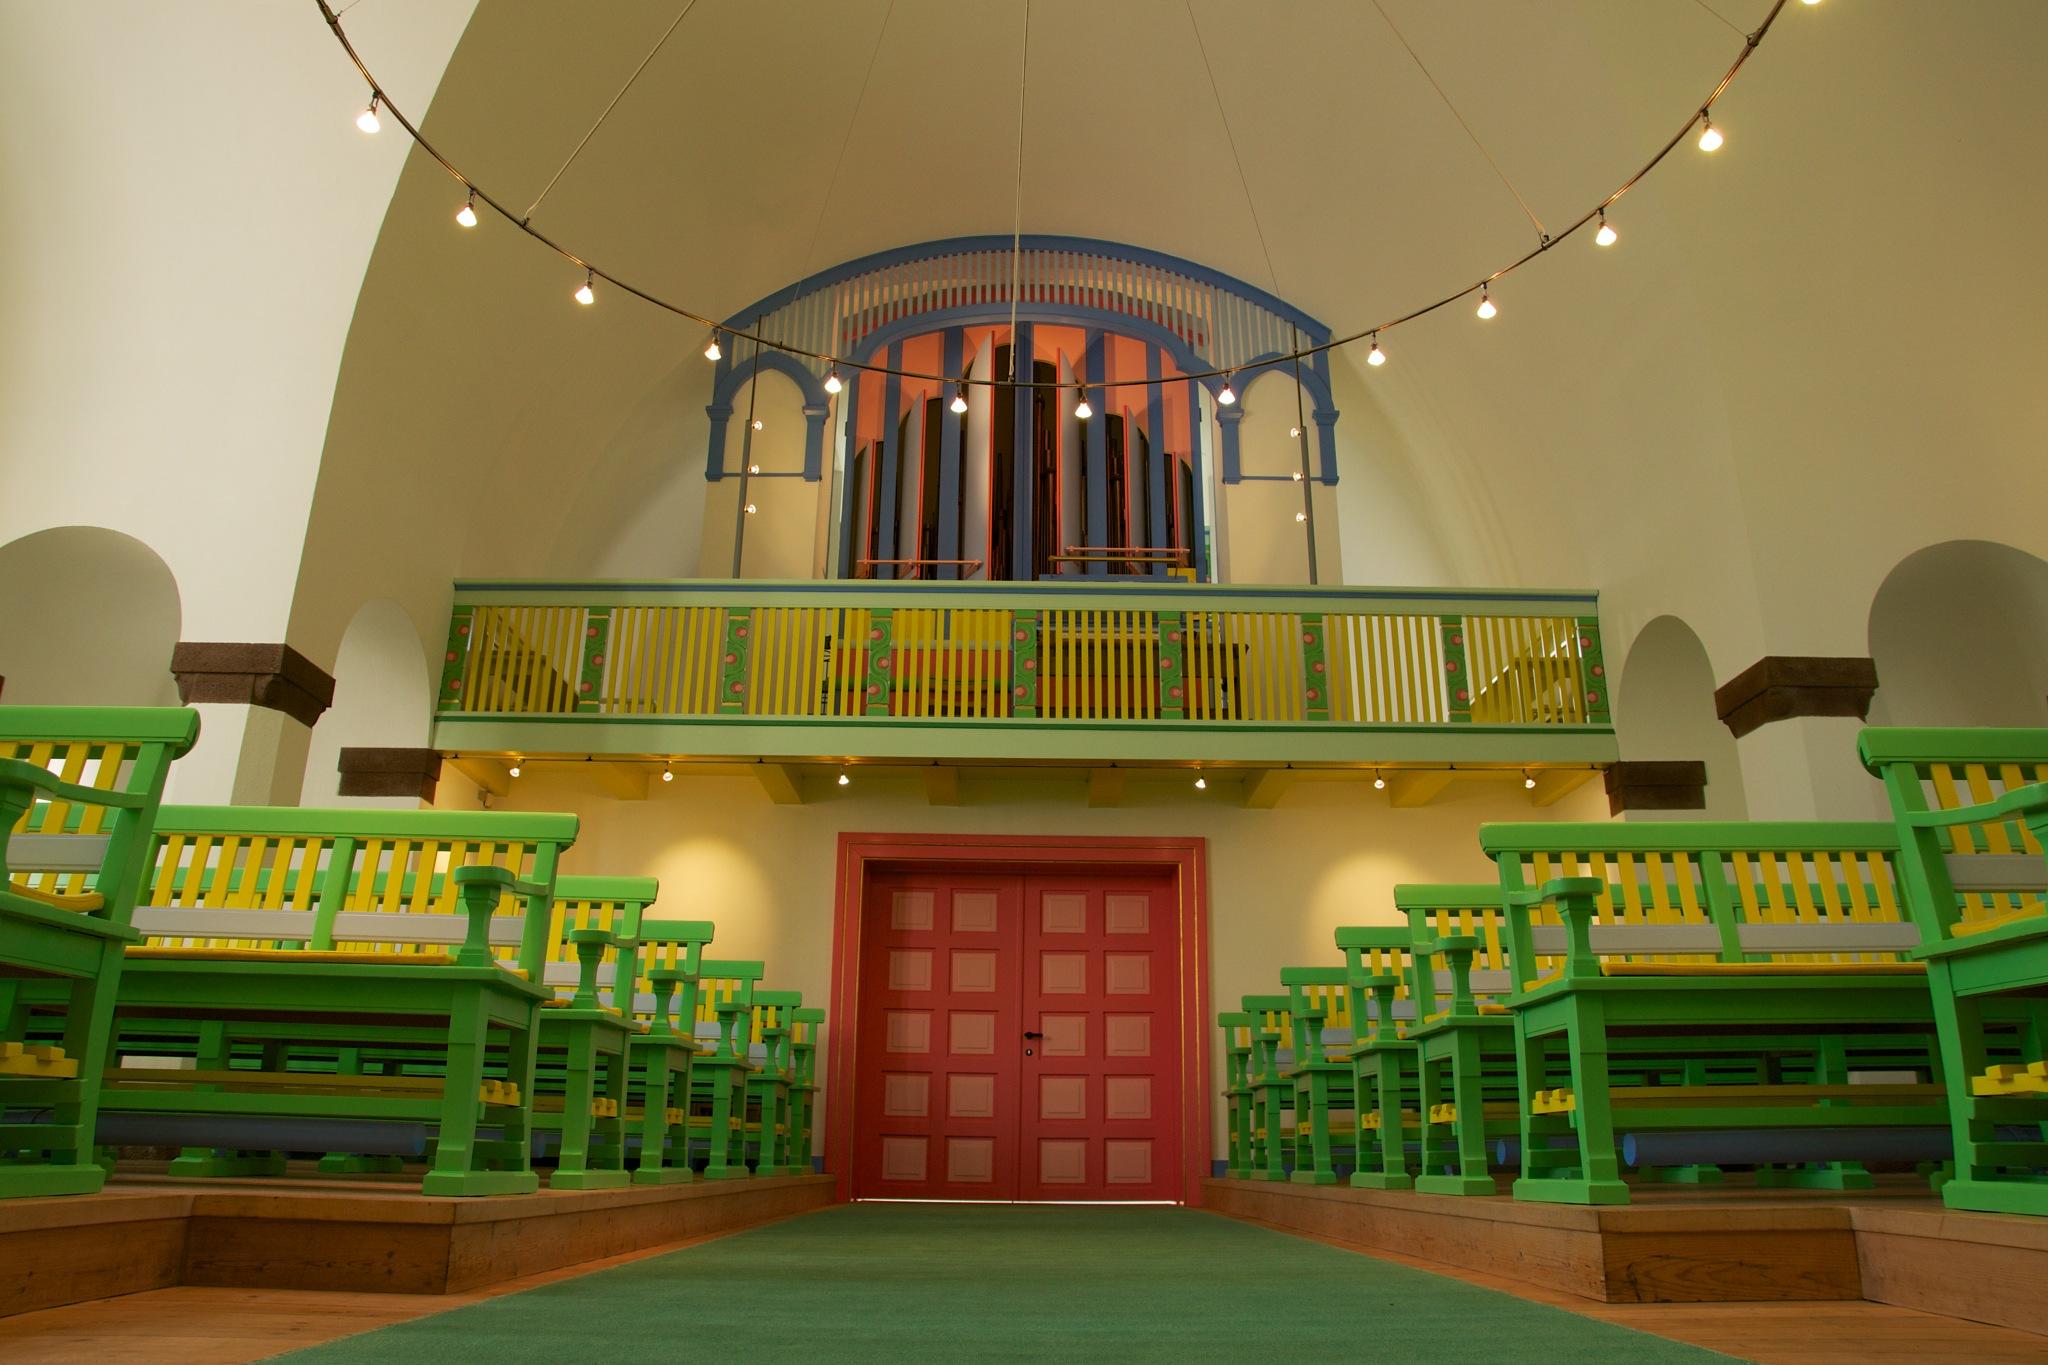 Colorful church by Per Borring